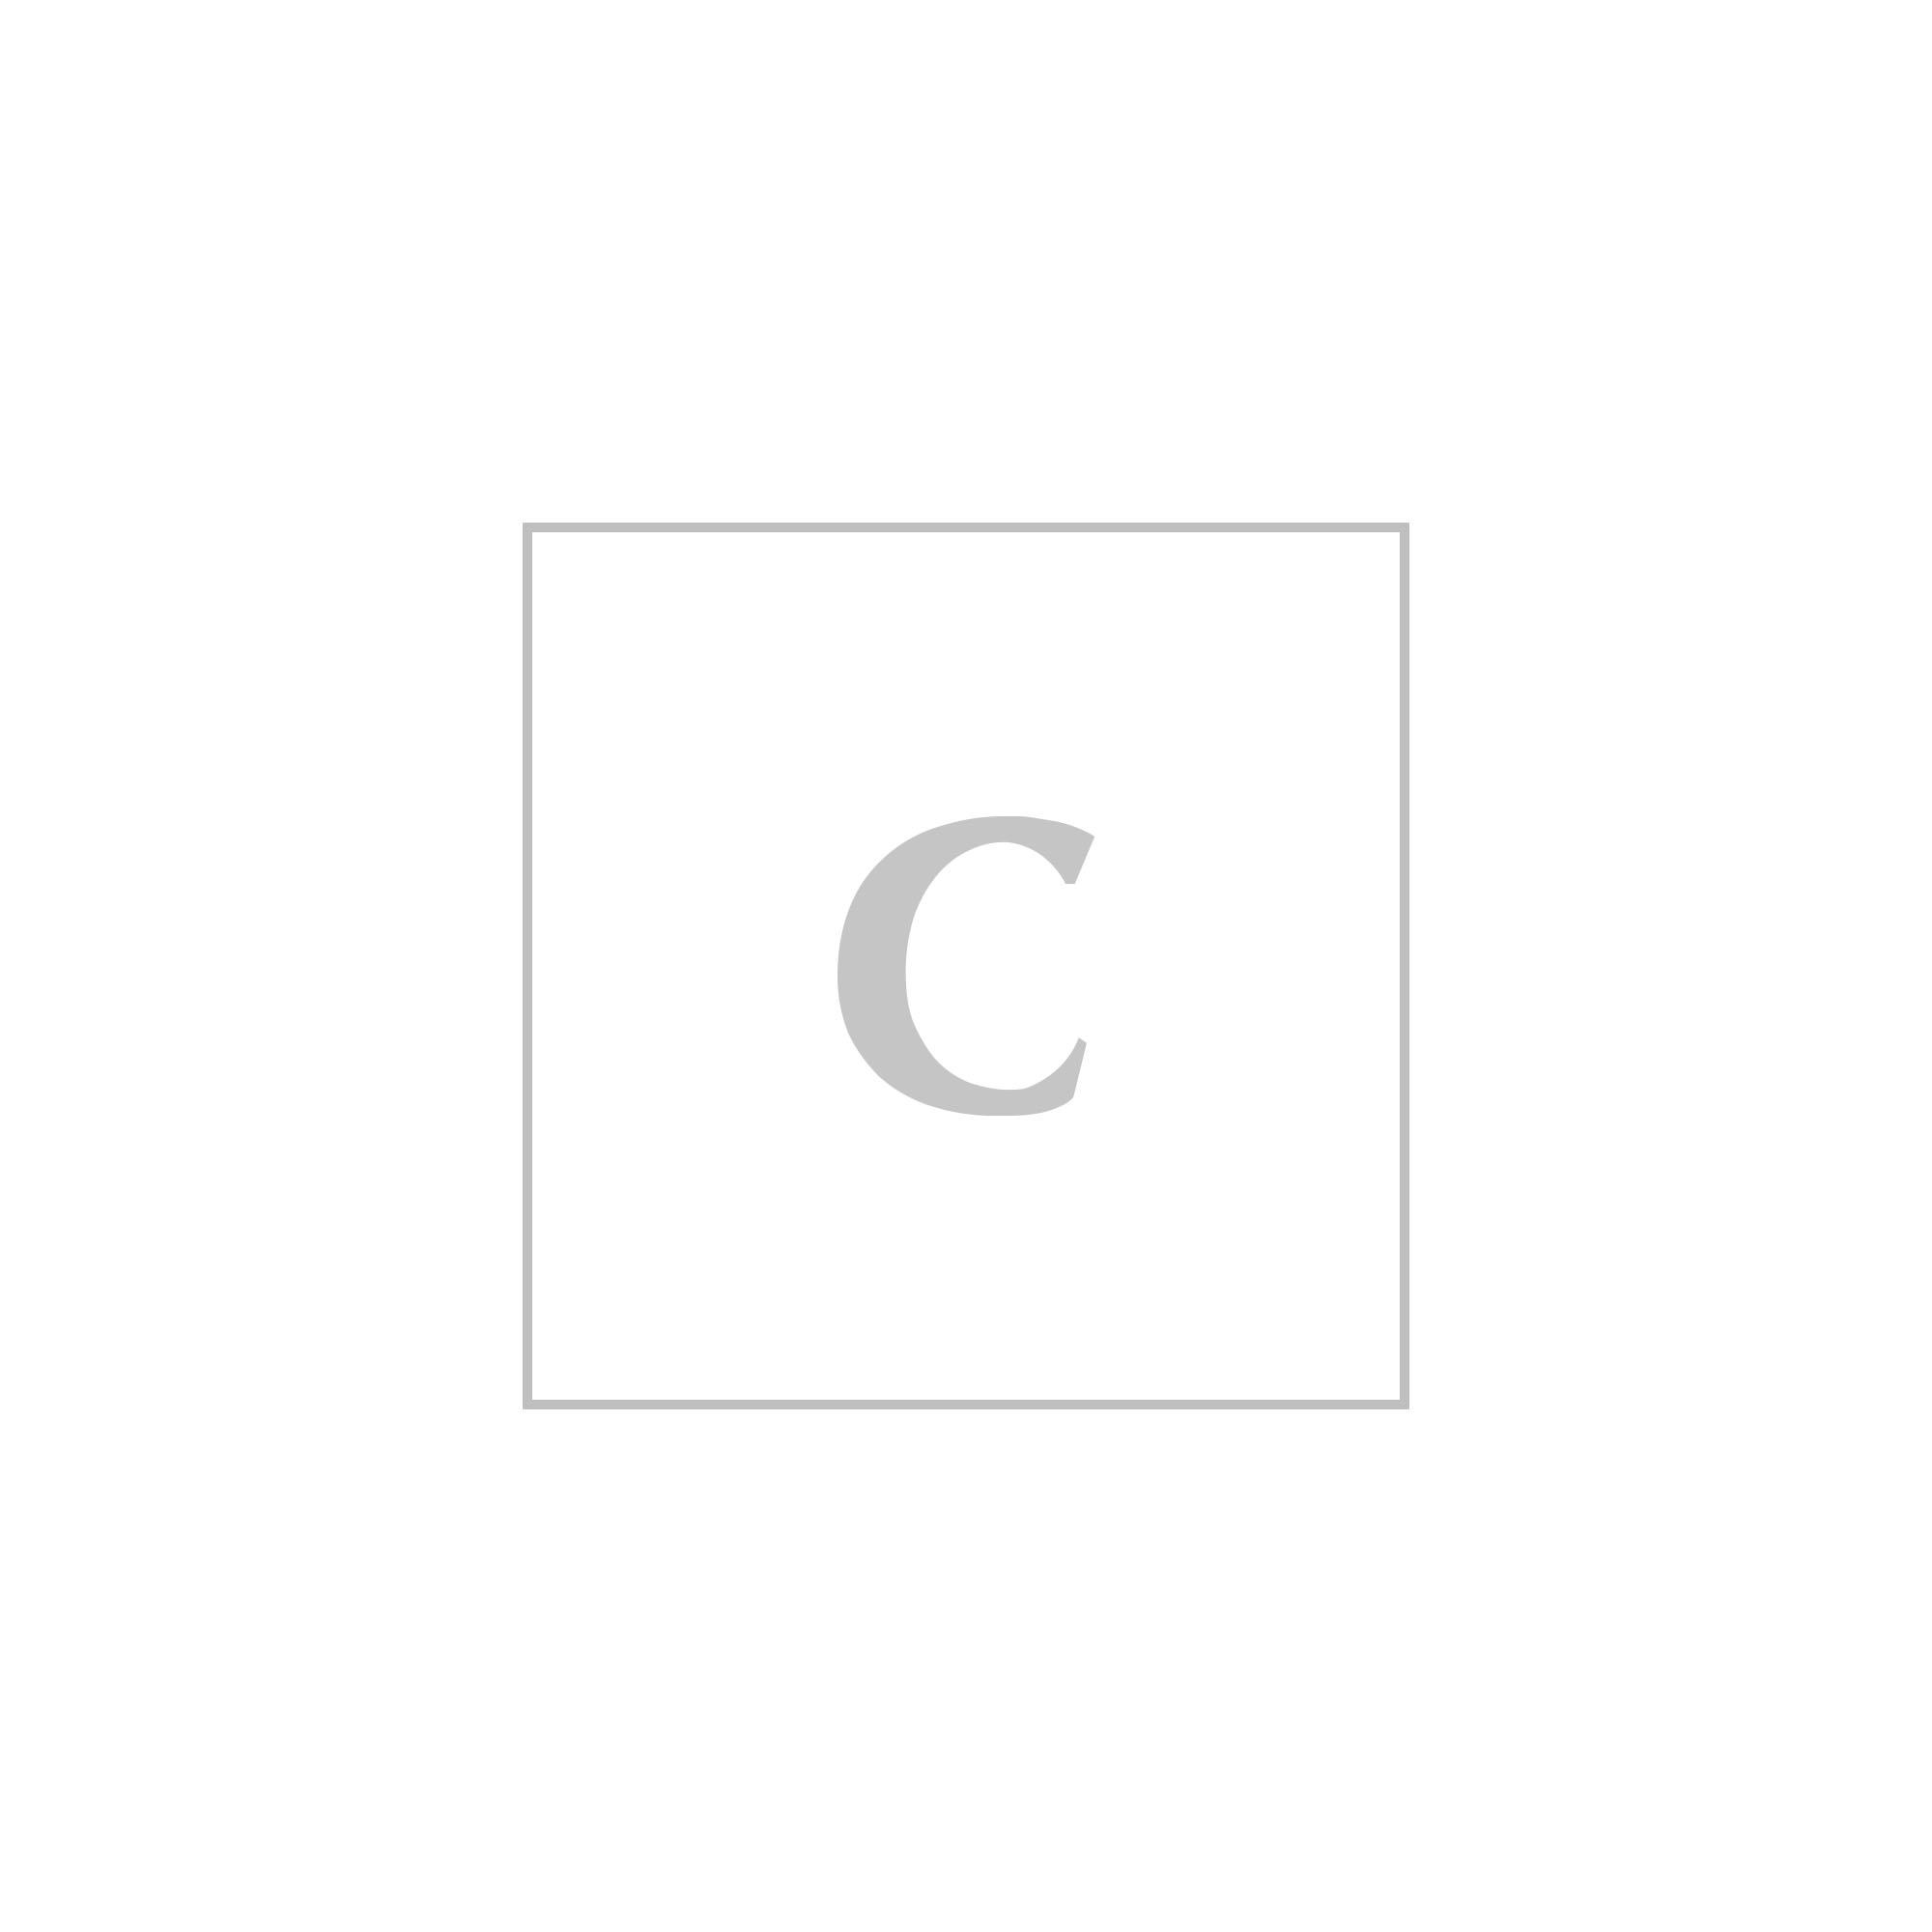 buy online 70396 706b1 Moncler Basic Piumini da Donna Nero